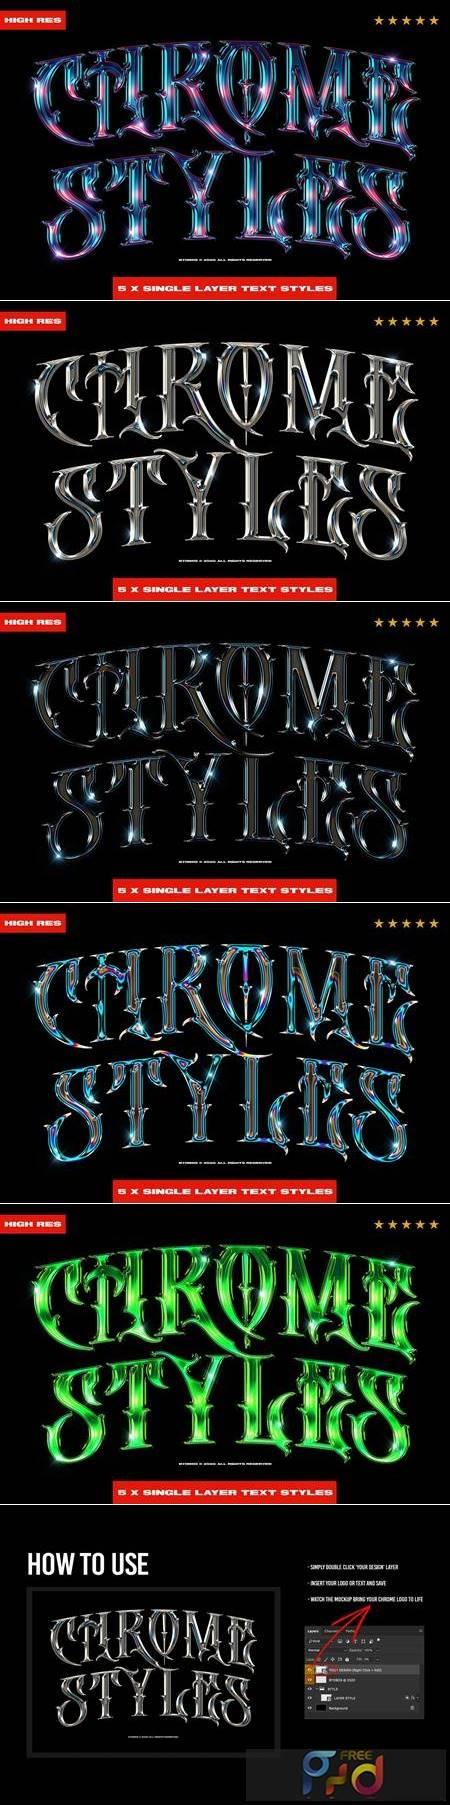 Chrome Text Styles 3.0 5703914 1